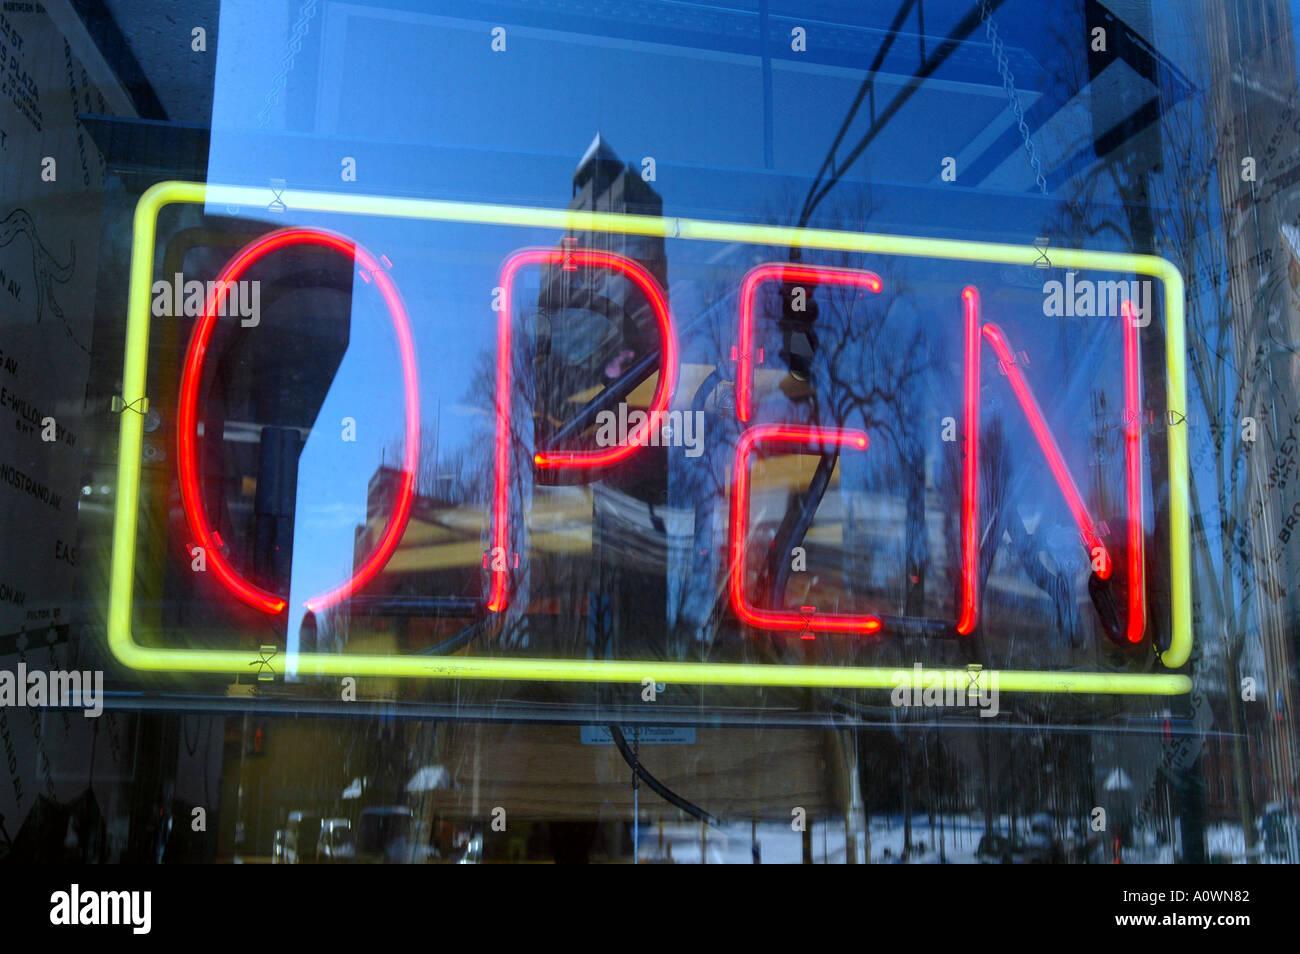 Open Sign New Haven Connecticut City Scenics Business Center Open for business business sign in window Stock Photo